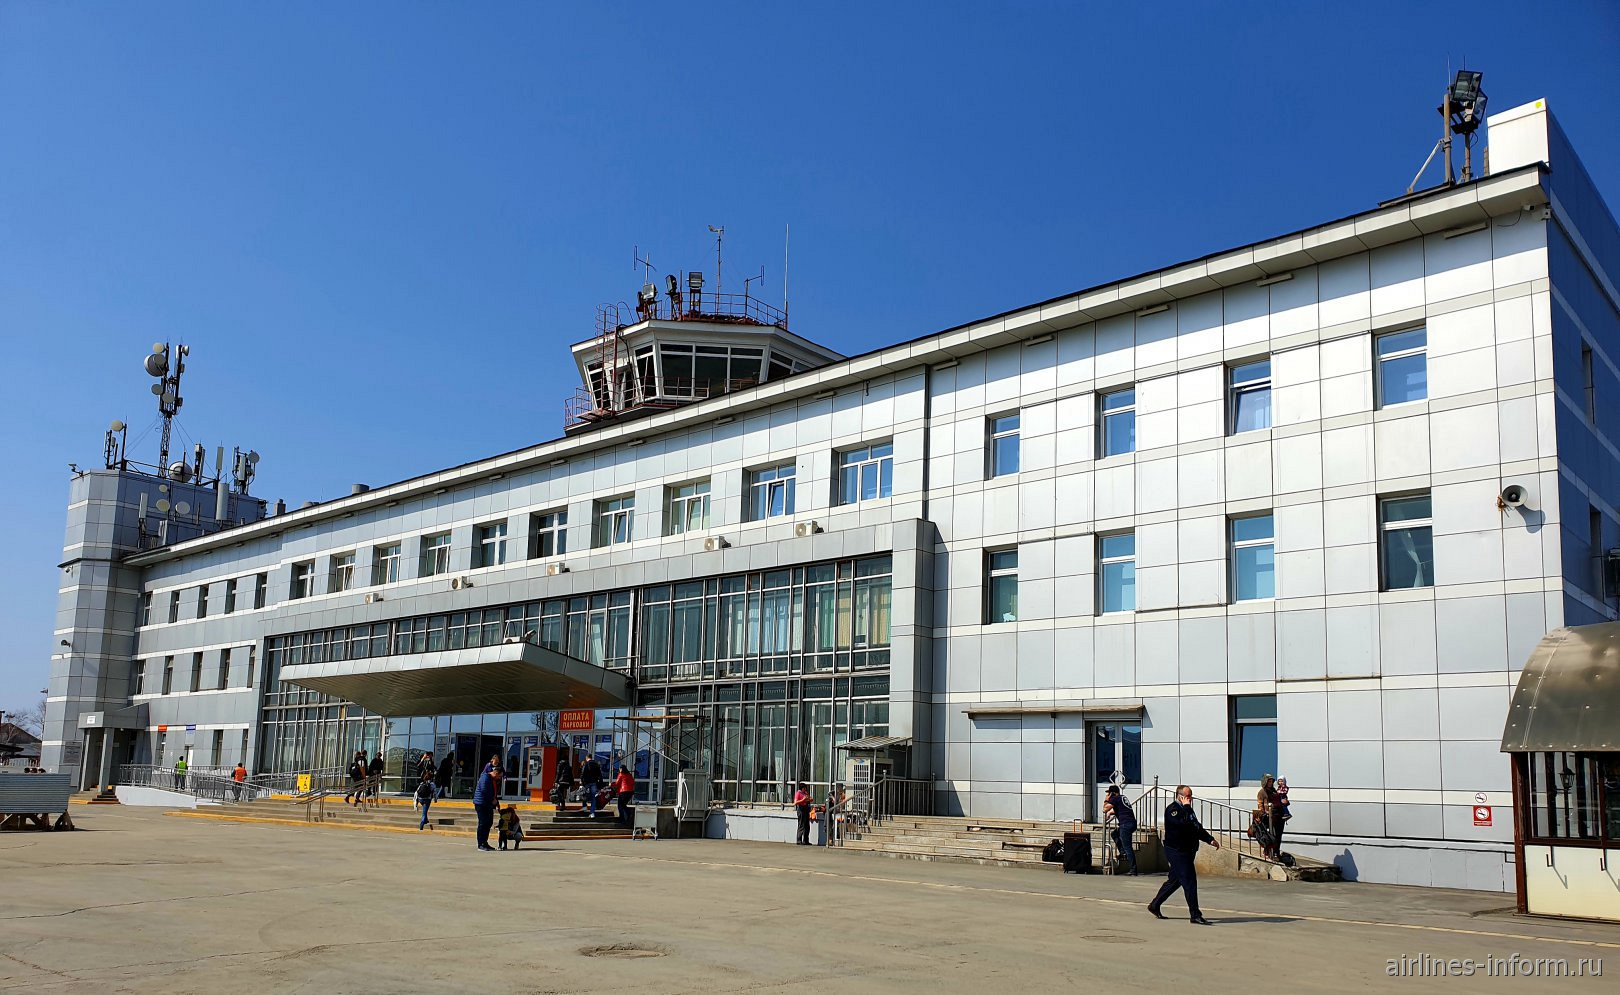 Старый аэровокзал аэропорта Южно-Сахалинск Хомутово